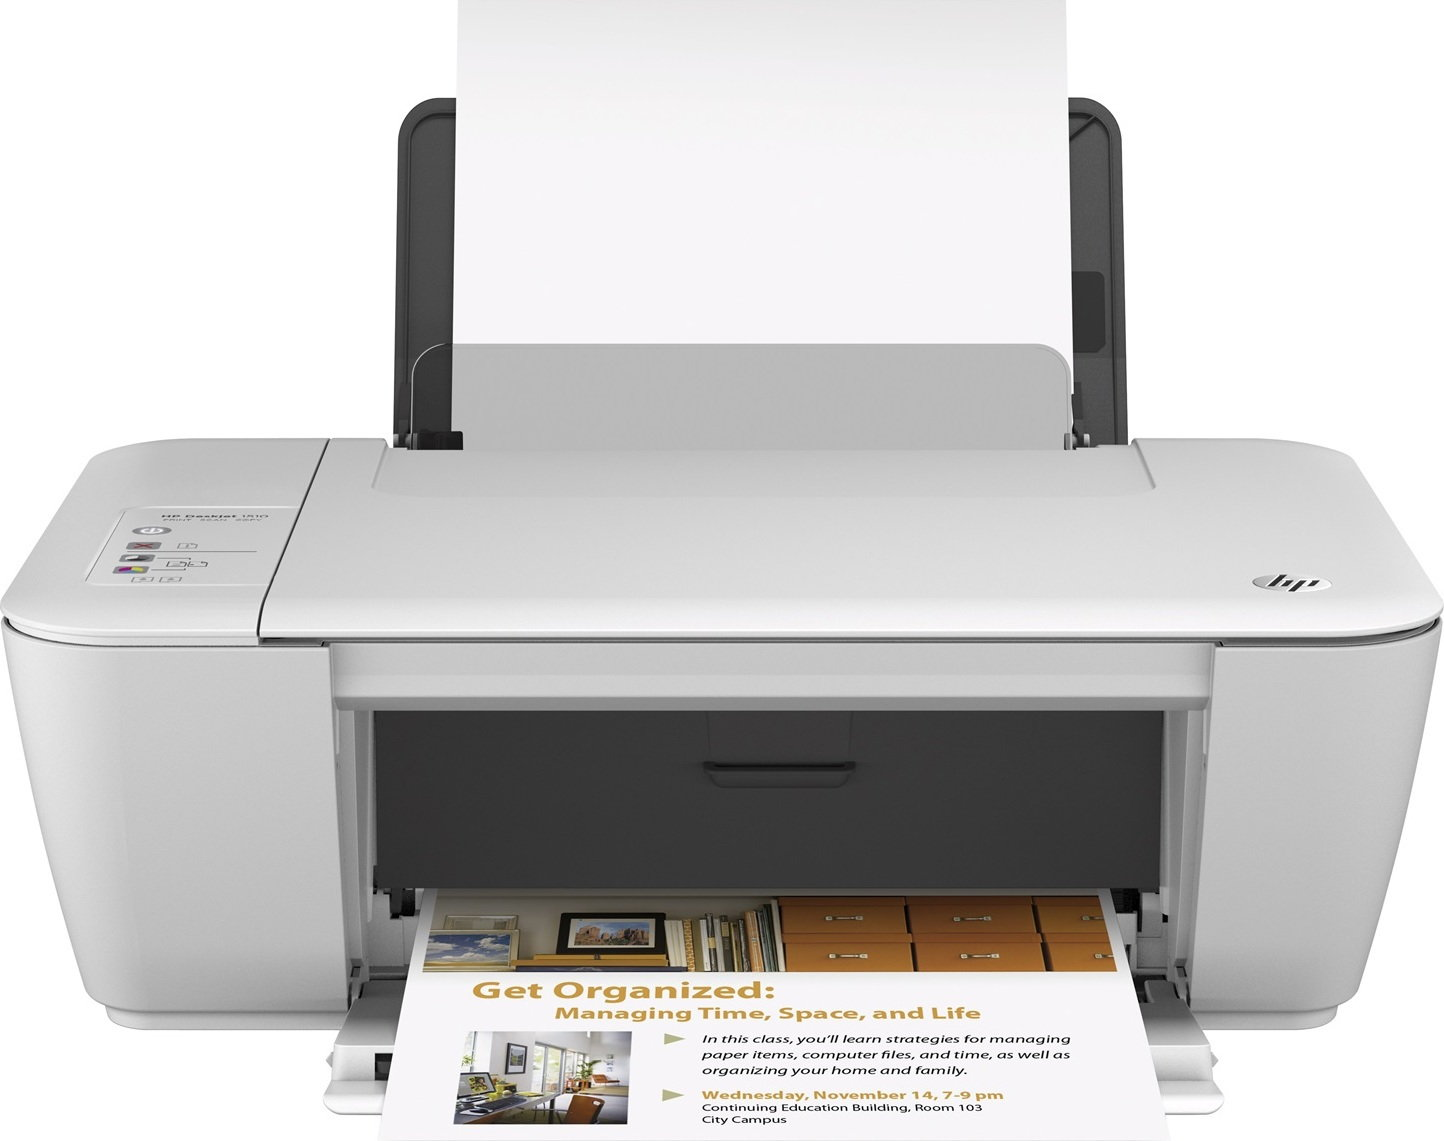 Hewlett-Packard 1510A instrukcja